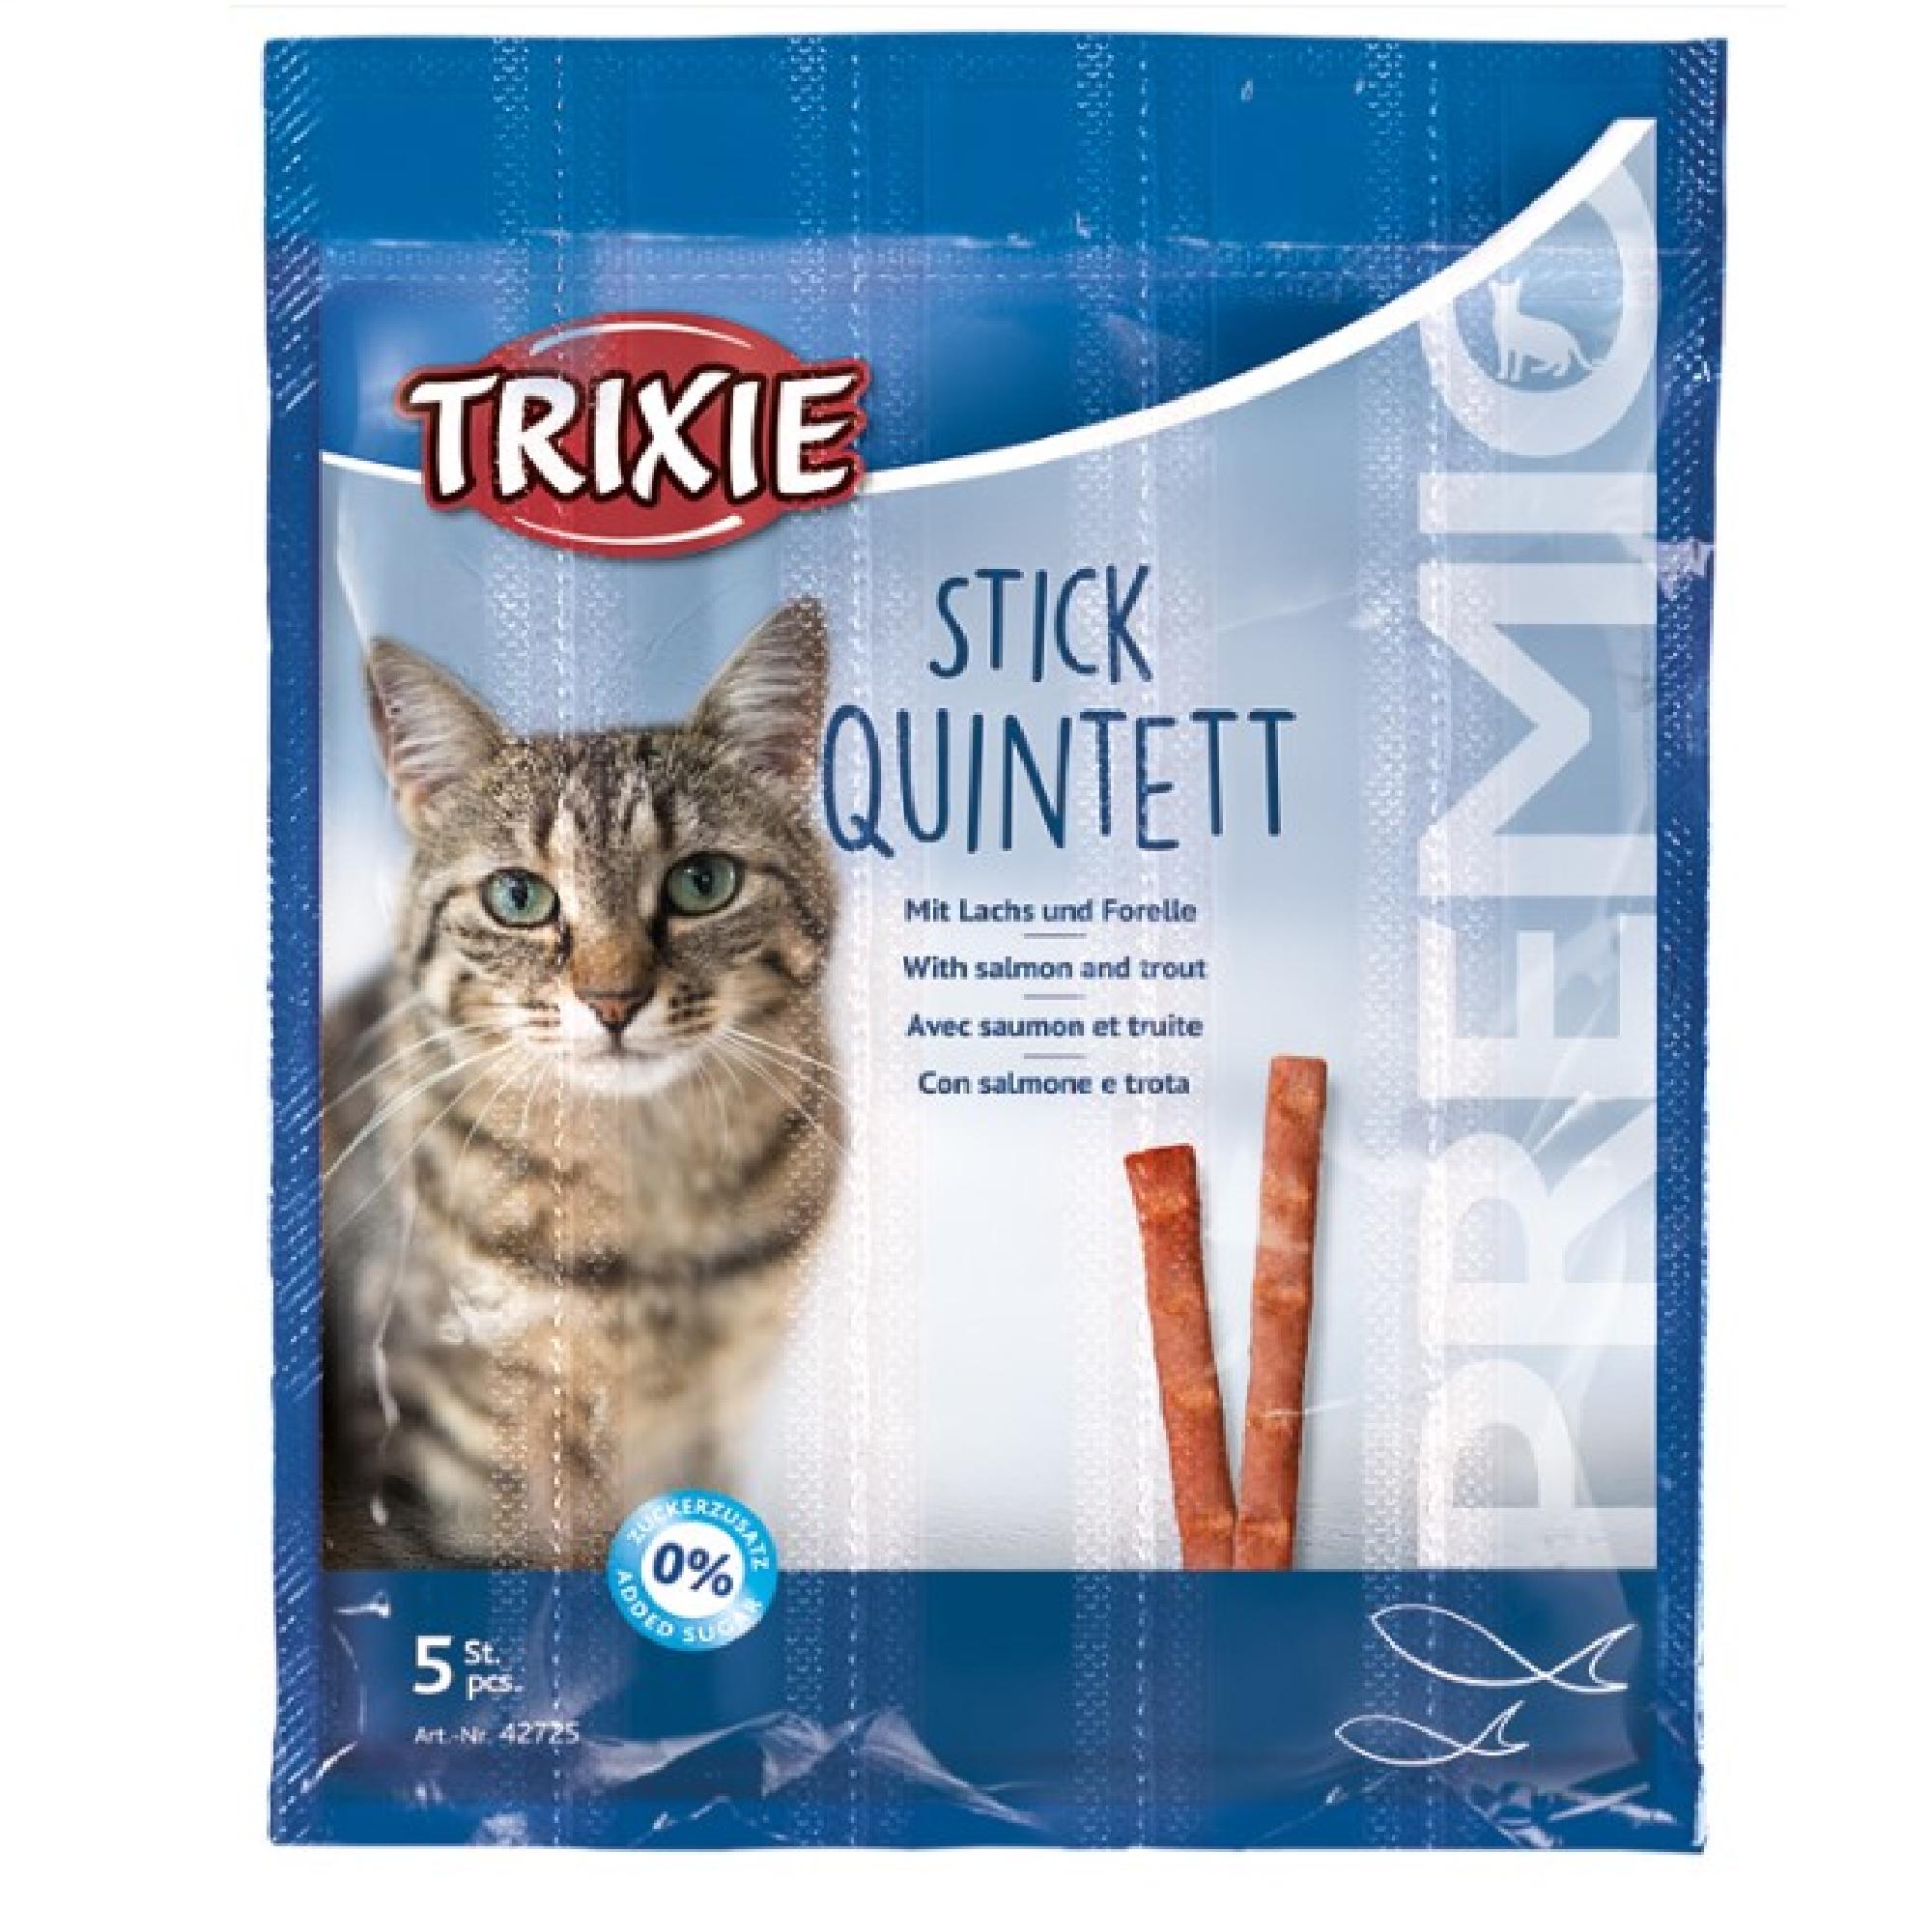 PREMIO Stick Quintett, Lax & Öring